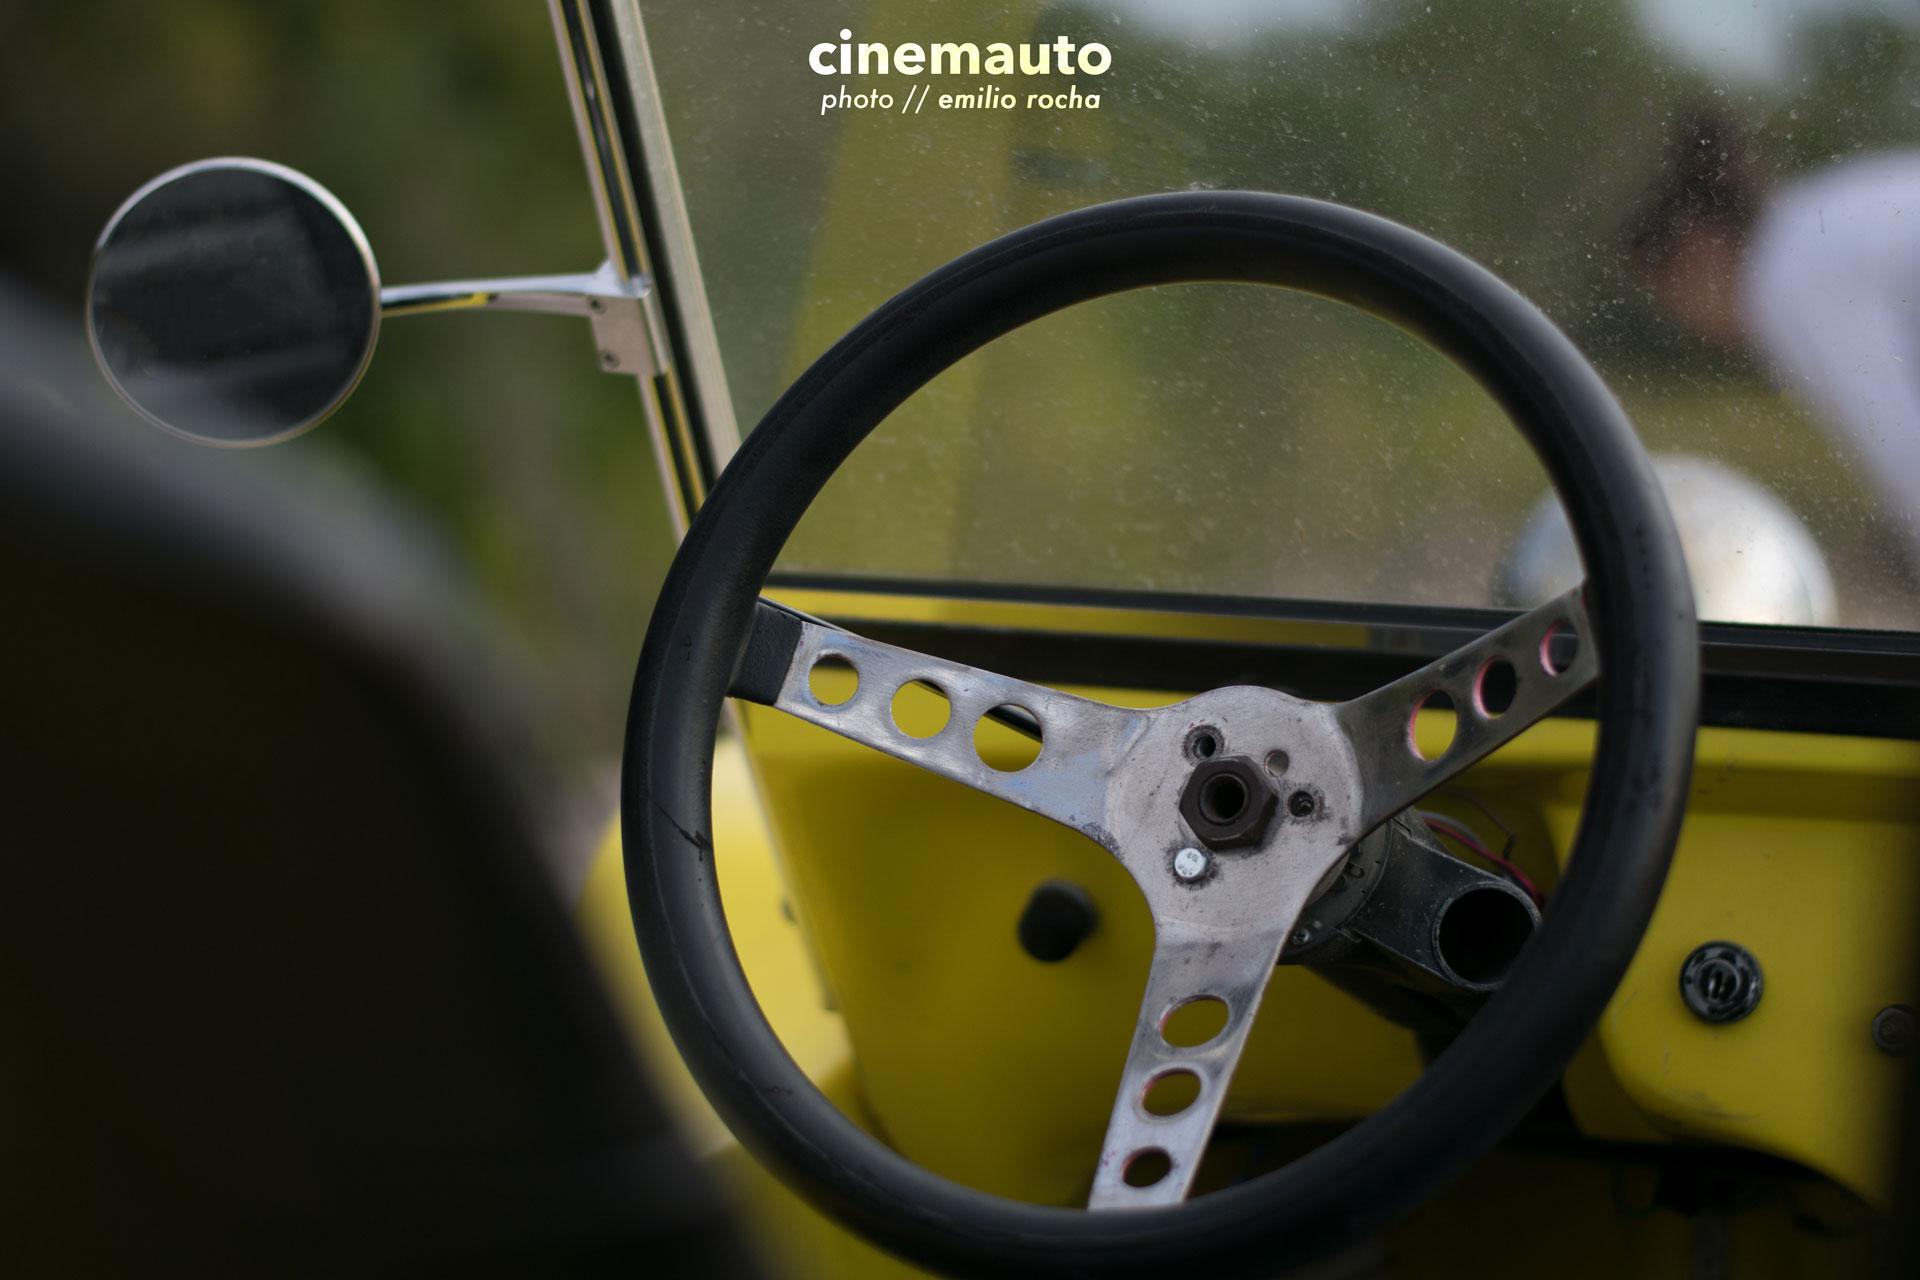 wichita-automotive-photography-cinemauto-gv6.jpg